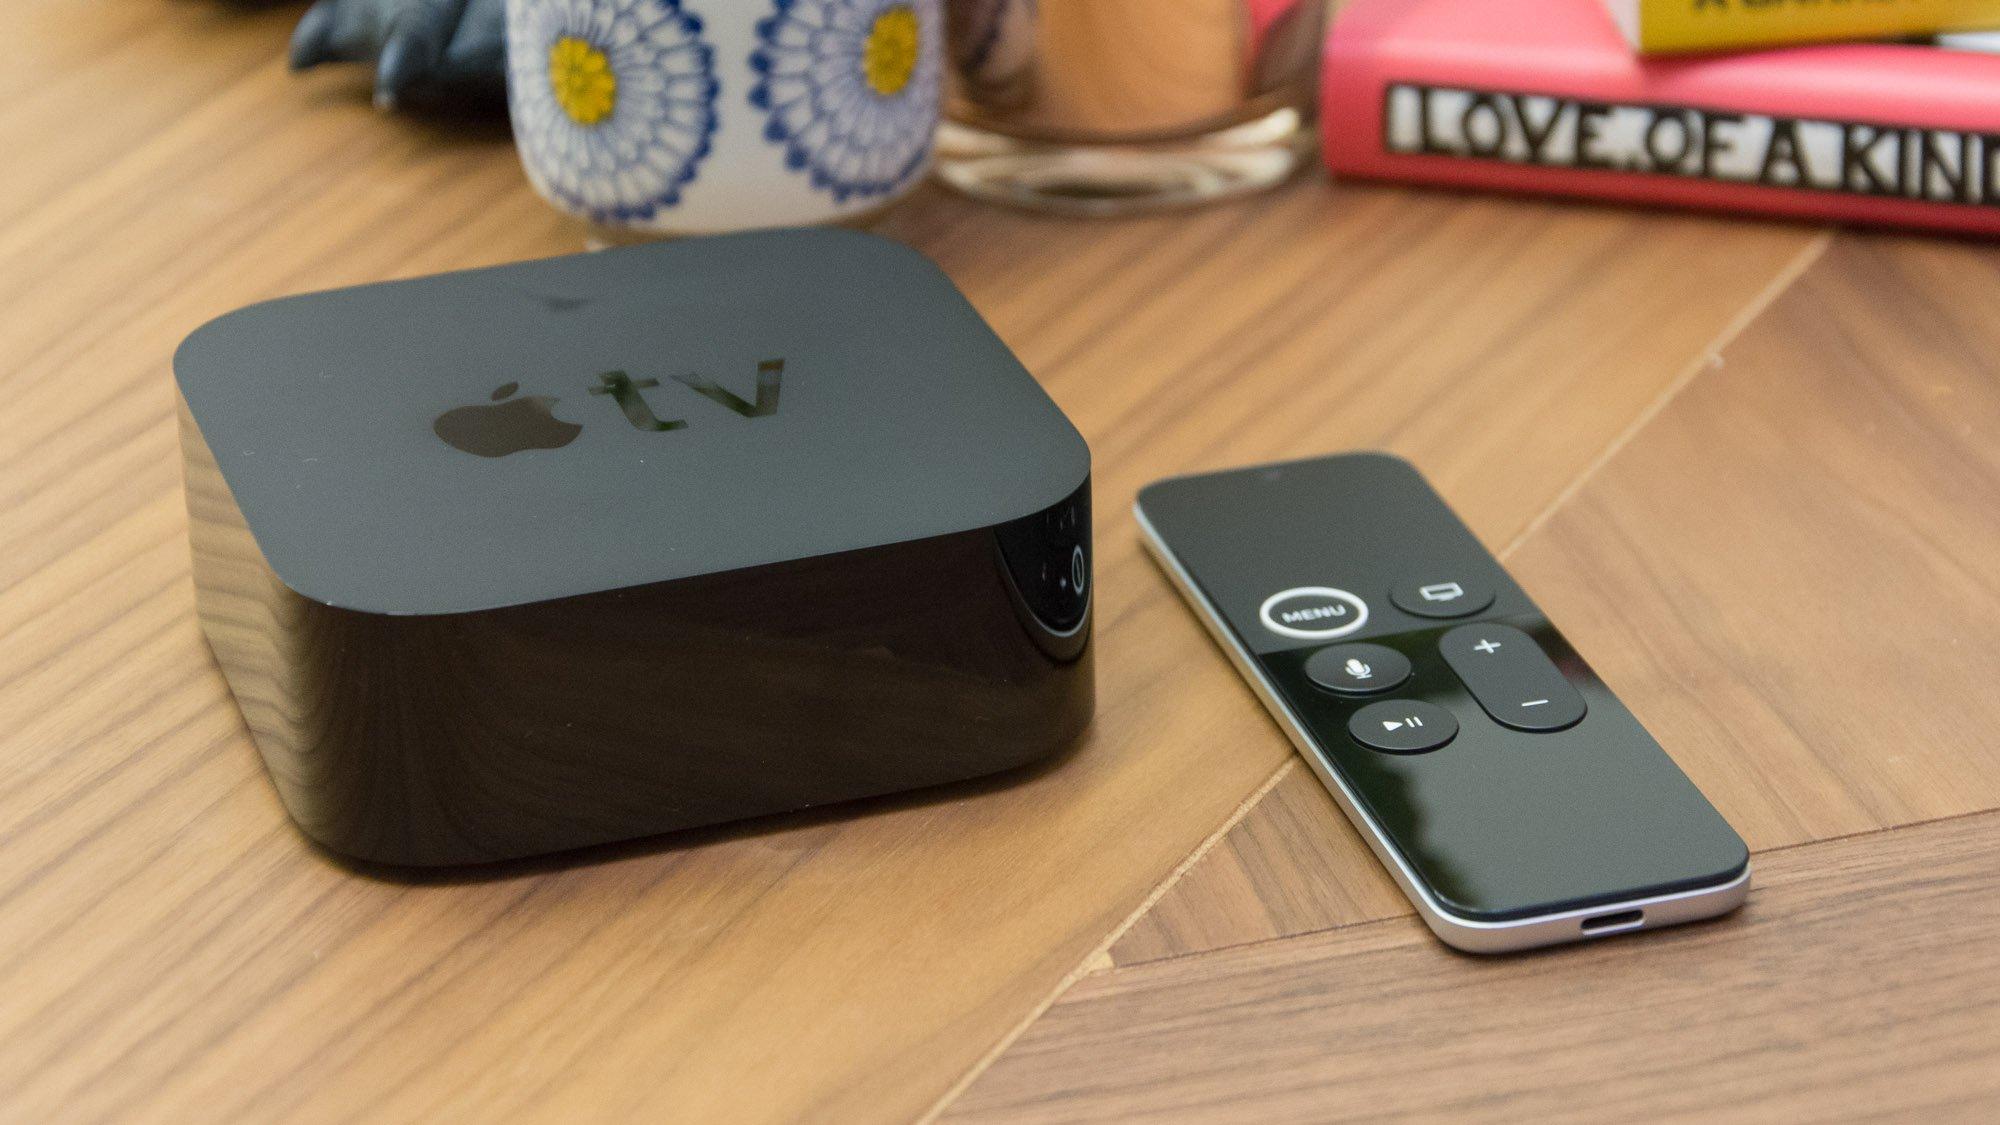 Apple tv box review uk dating